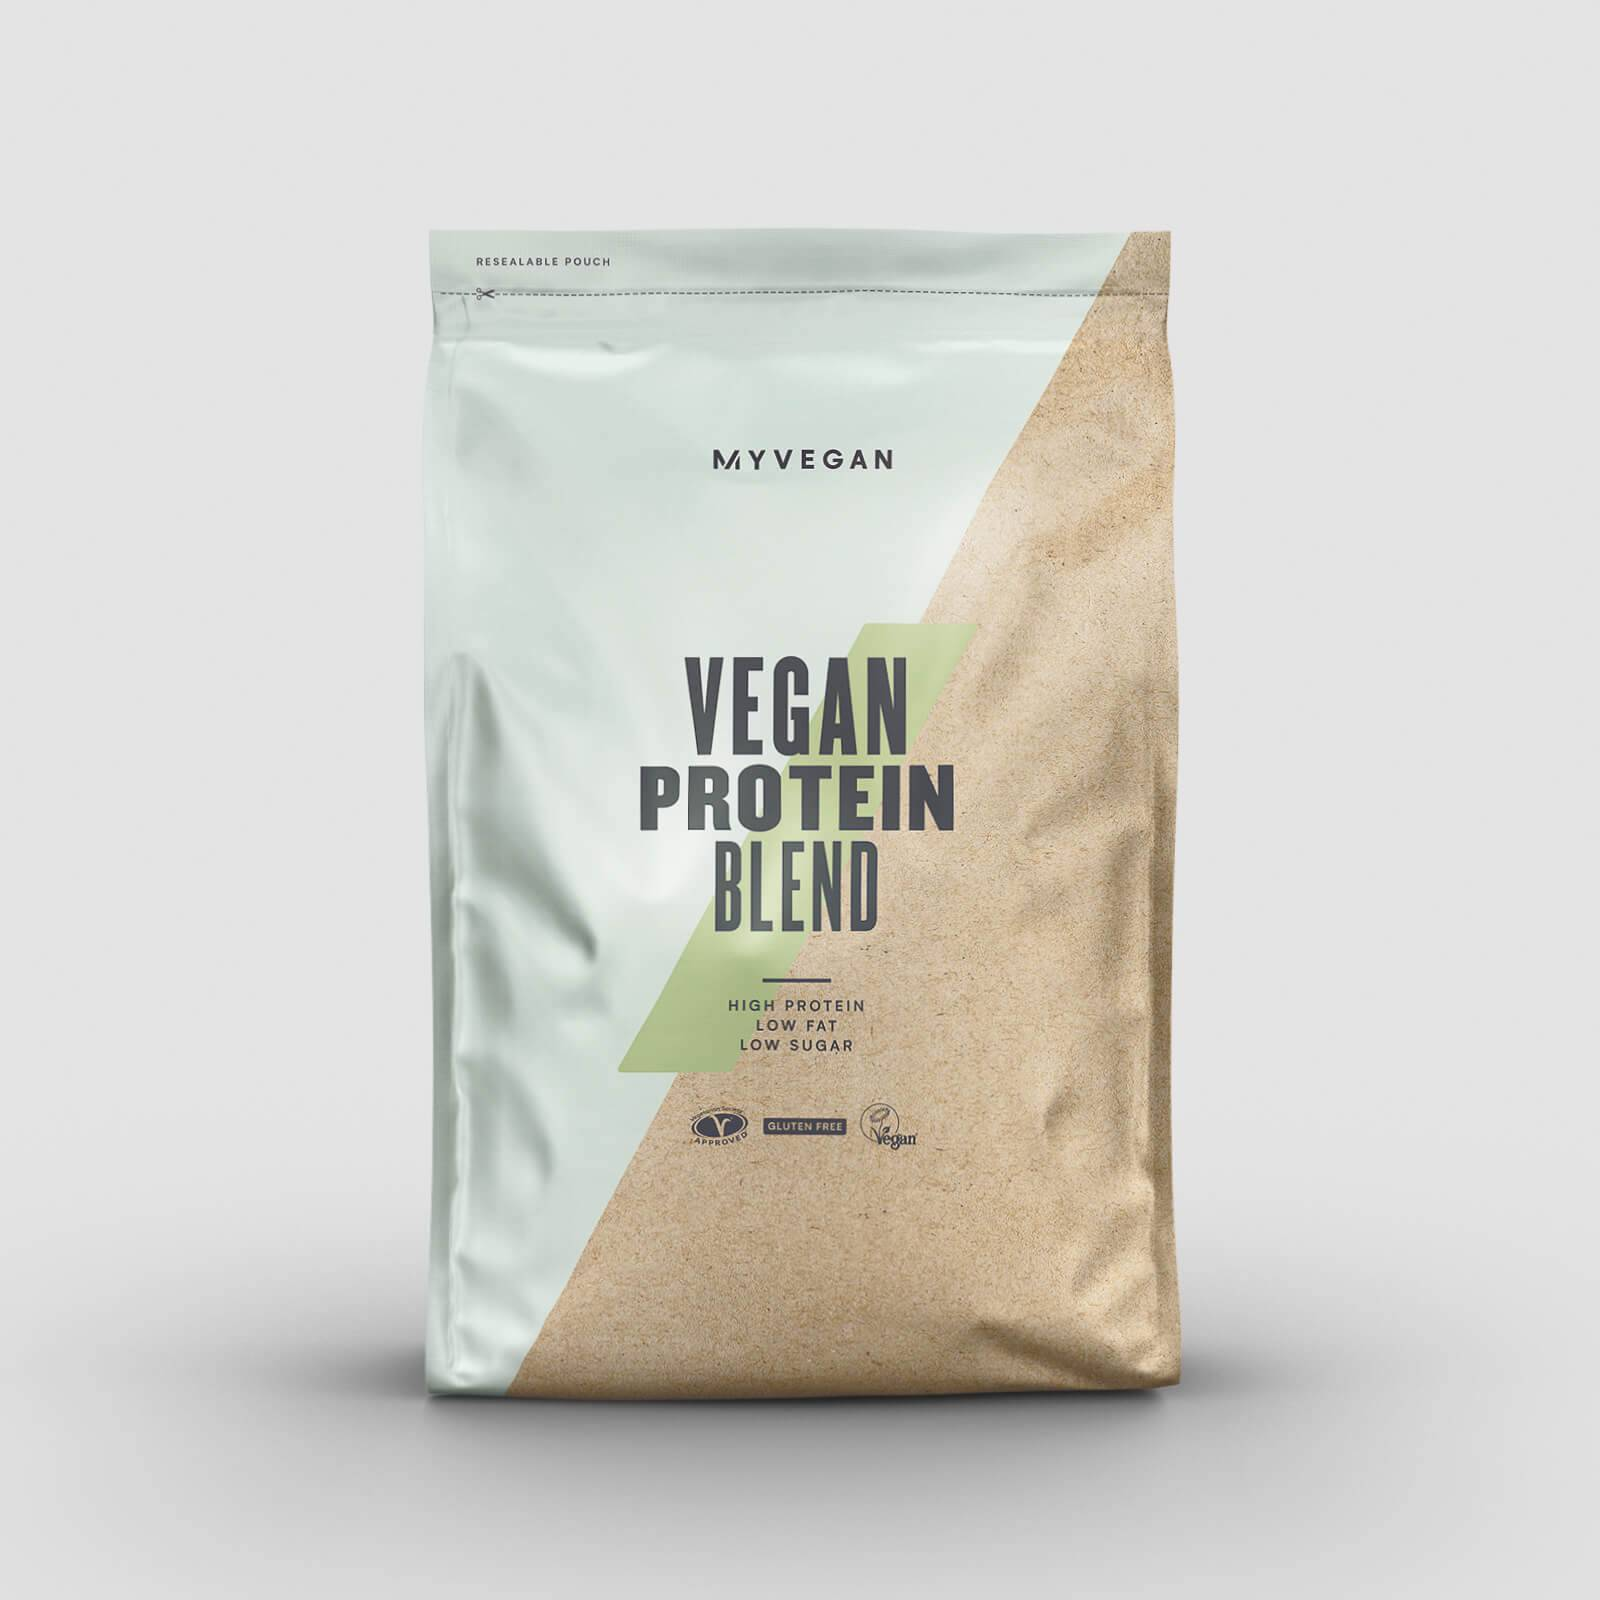 Myvegan Mélange de protéines végétales - 2.5kg - Coffee & Walnut